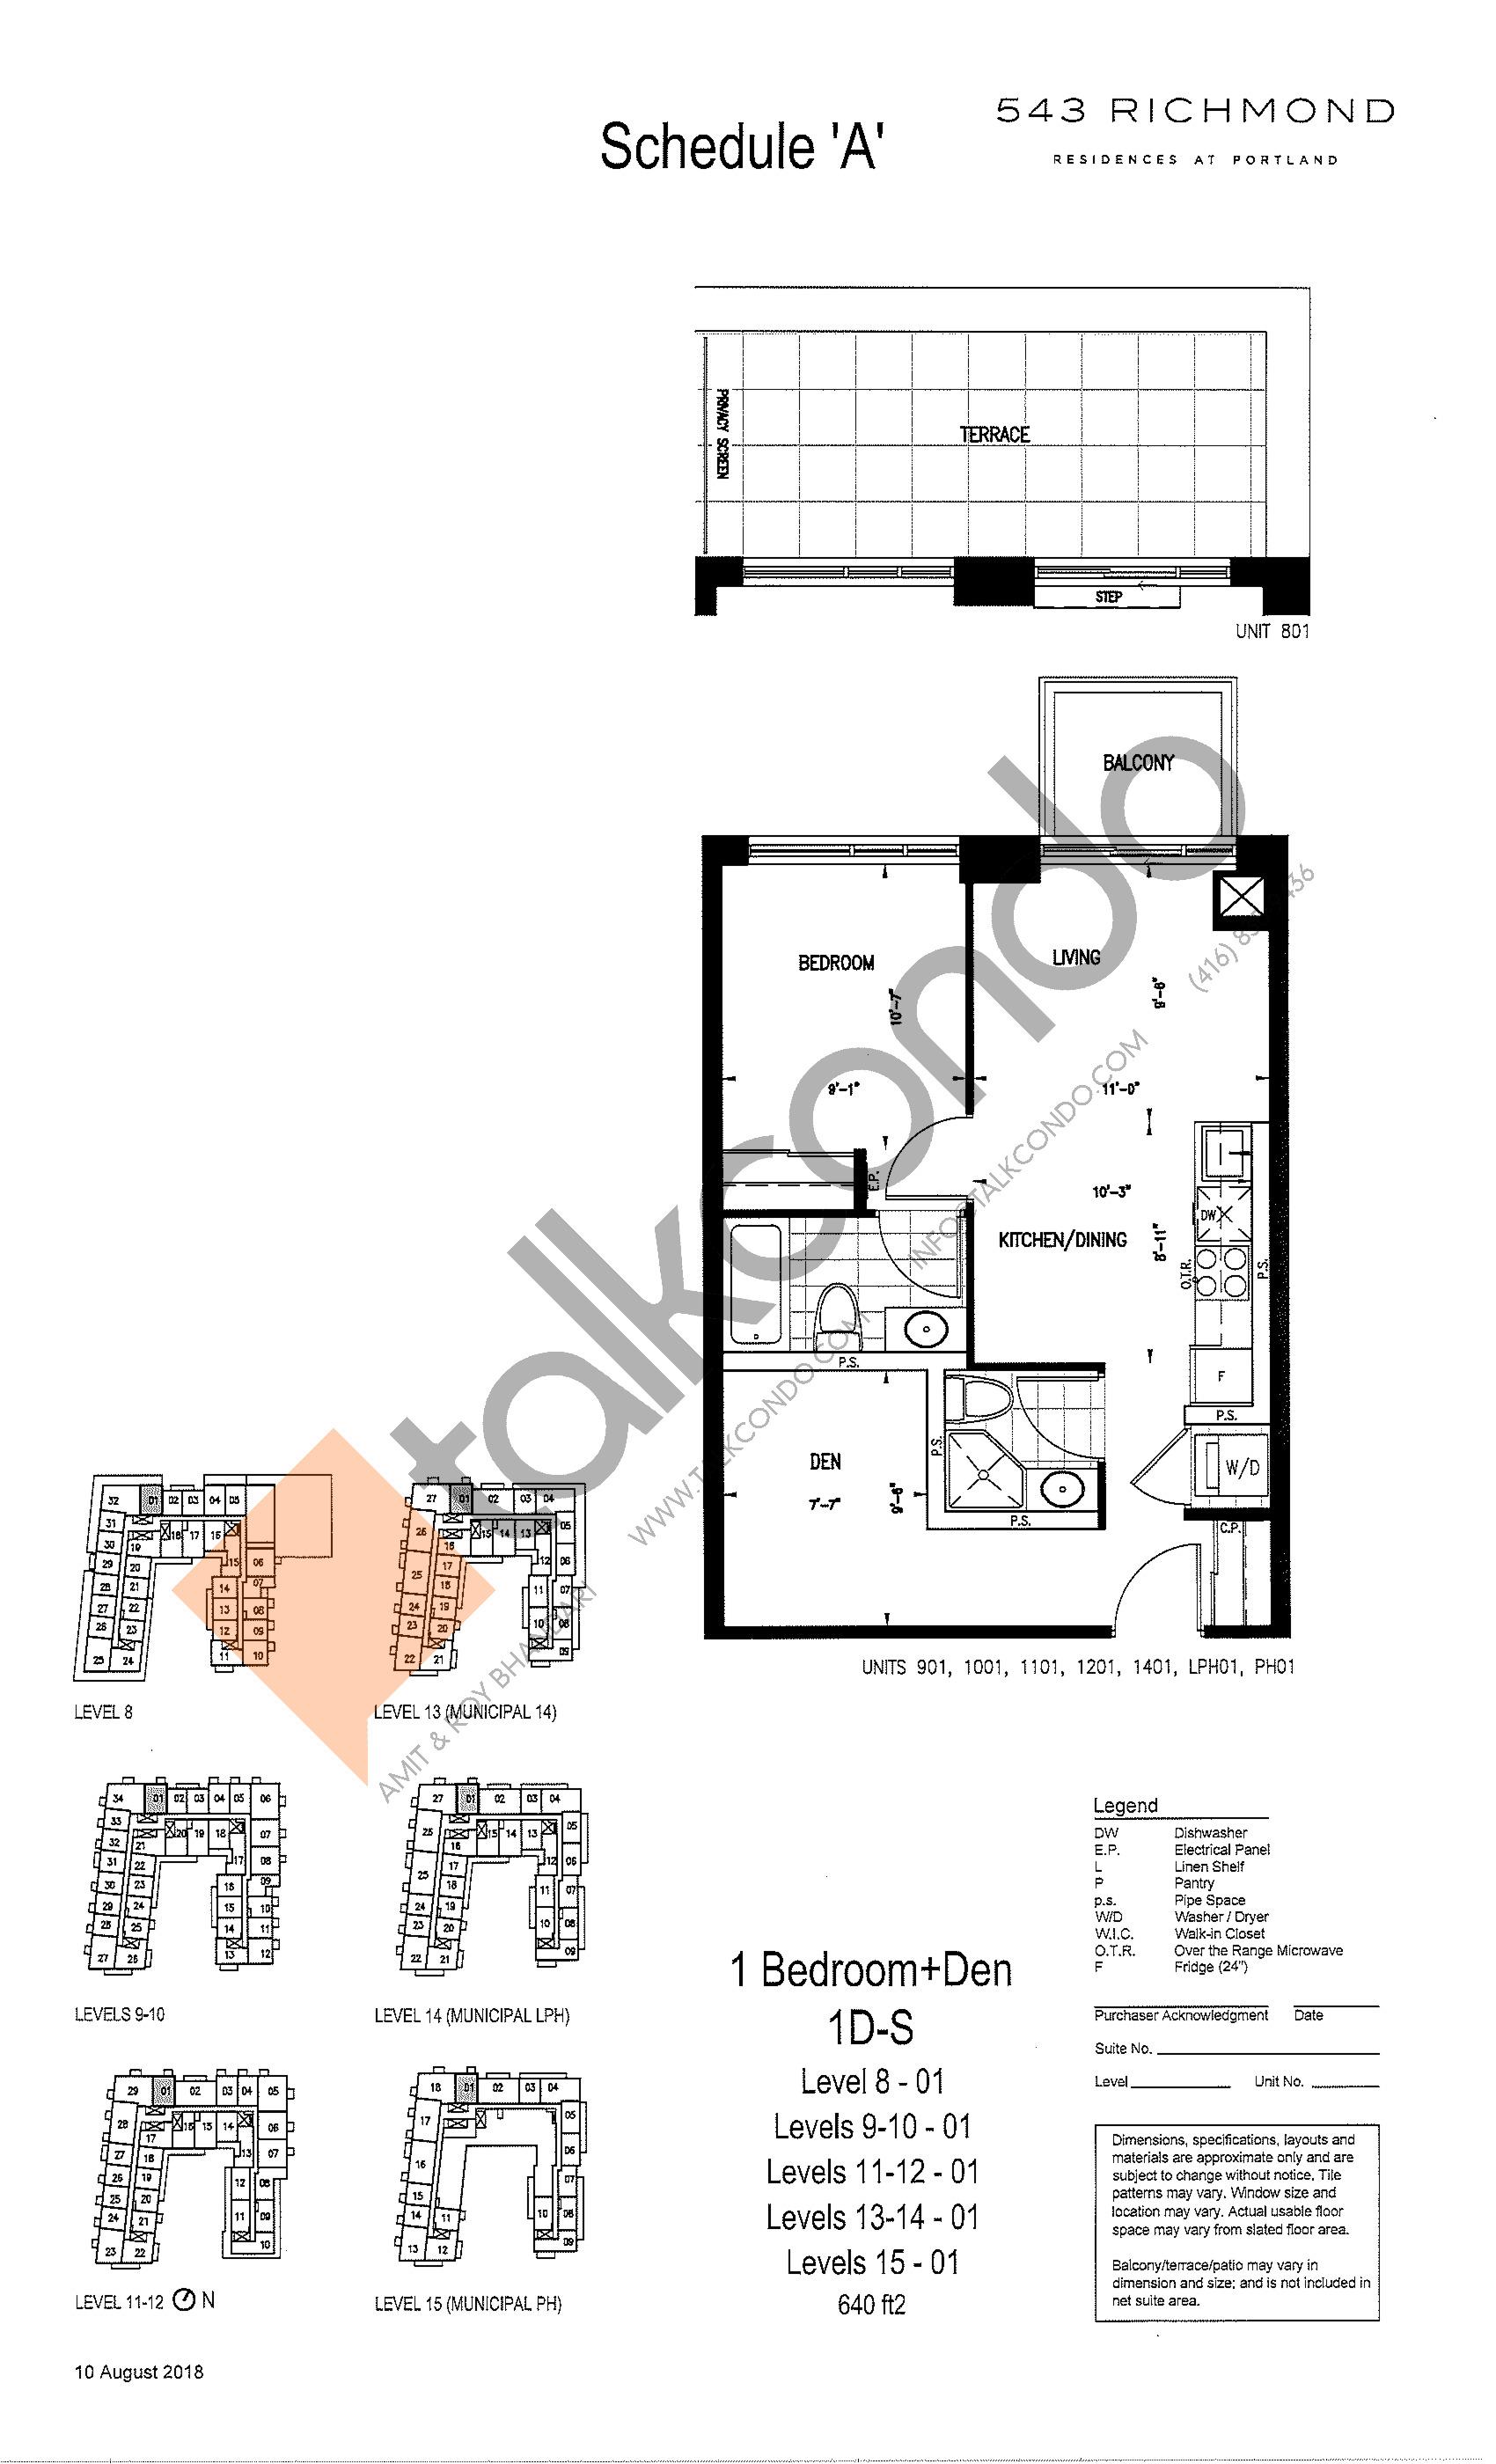 1D-S Floor Plan at 543 Richmond St Condos - 640 sq.ft